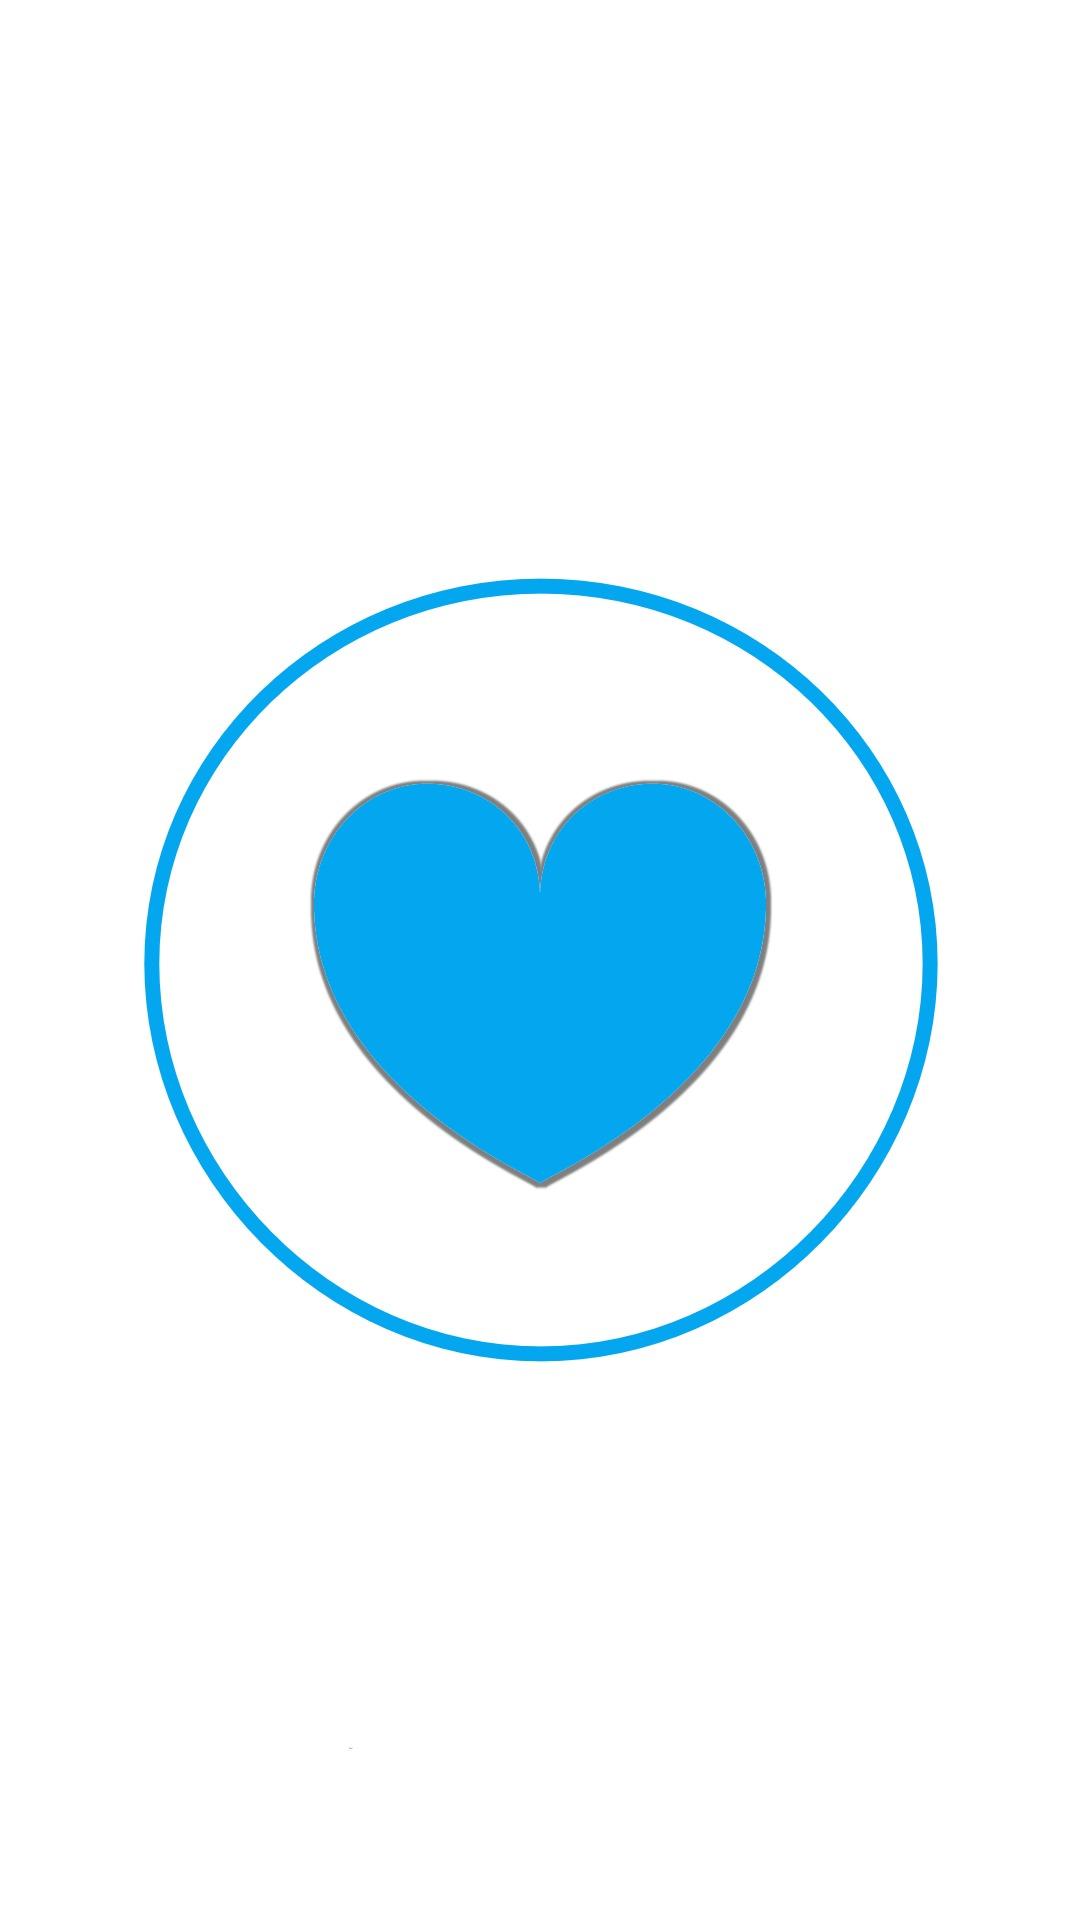 Instagram-cover-baby-heart-lotnotes.com.jpg